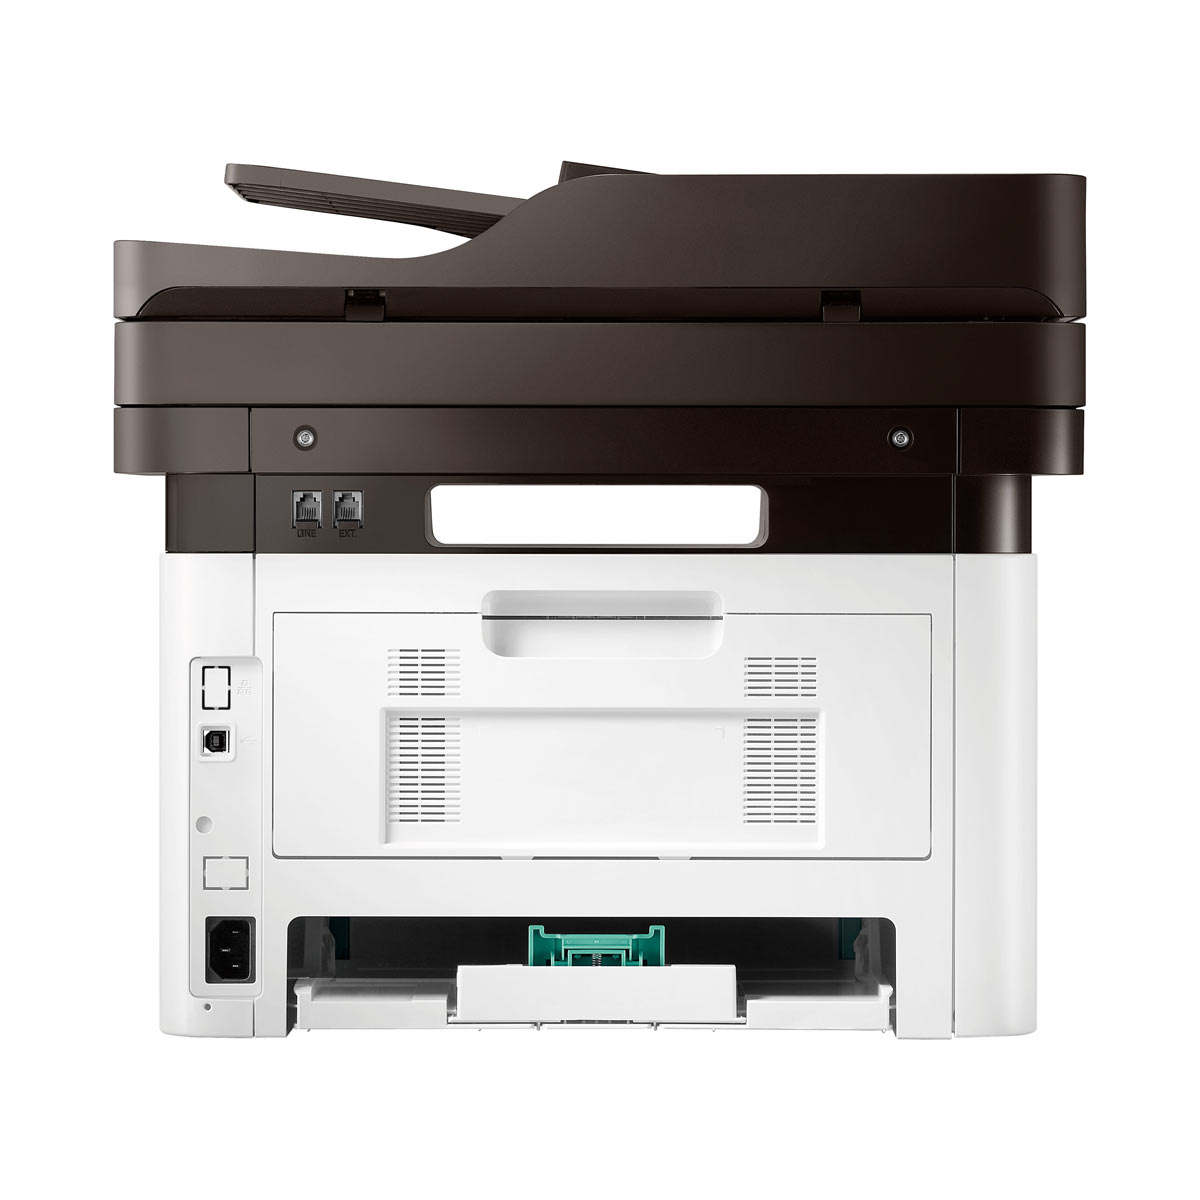 Samsung SL-M2675FN (Laser Mono./Fax/Reseau) (SL-M2675FN/SEE) - Achat / Vente Imprimante Multifonction sur Cybertek.fr - 4